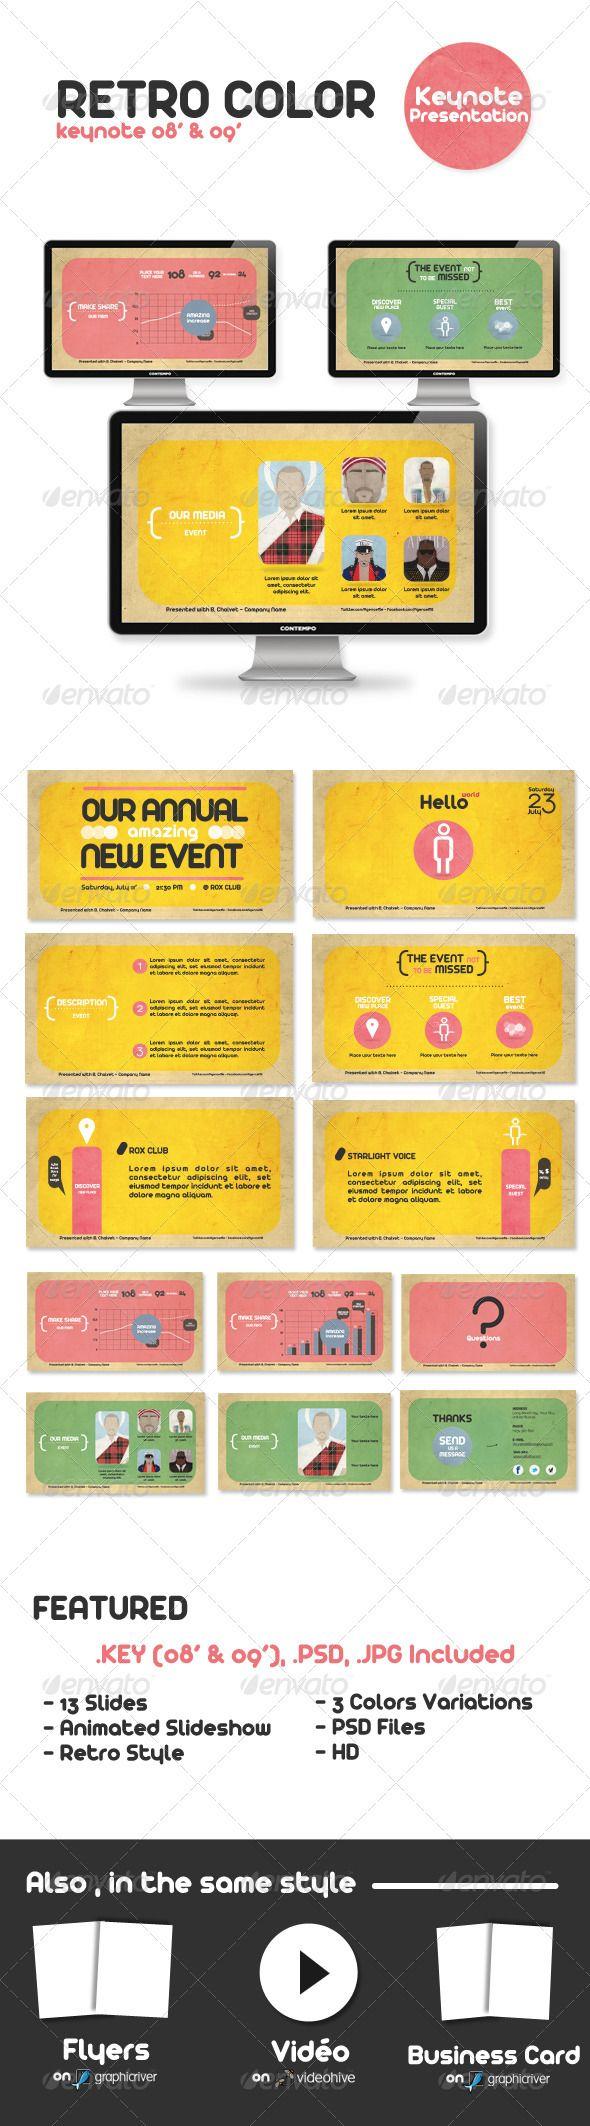 Retro Color Keynote Presentation - GraphicRiver Item for Sale